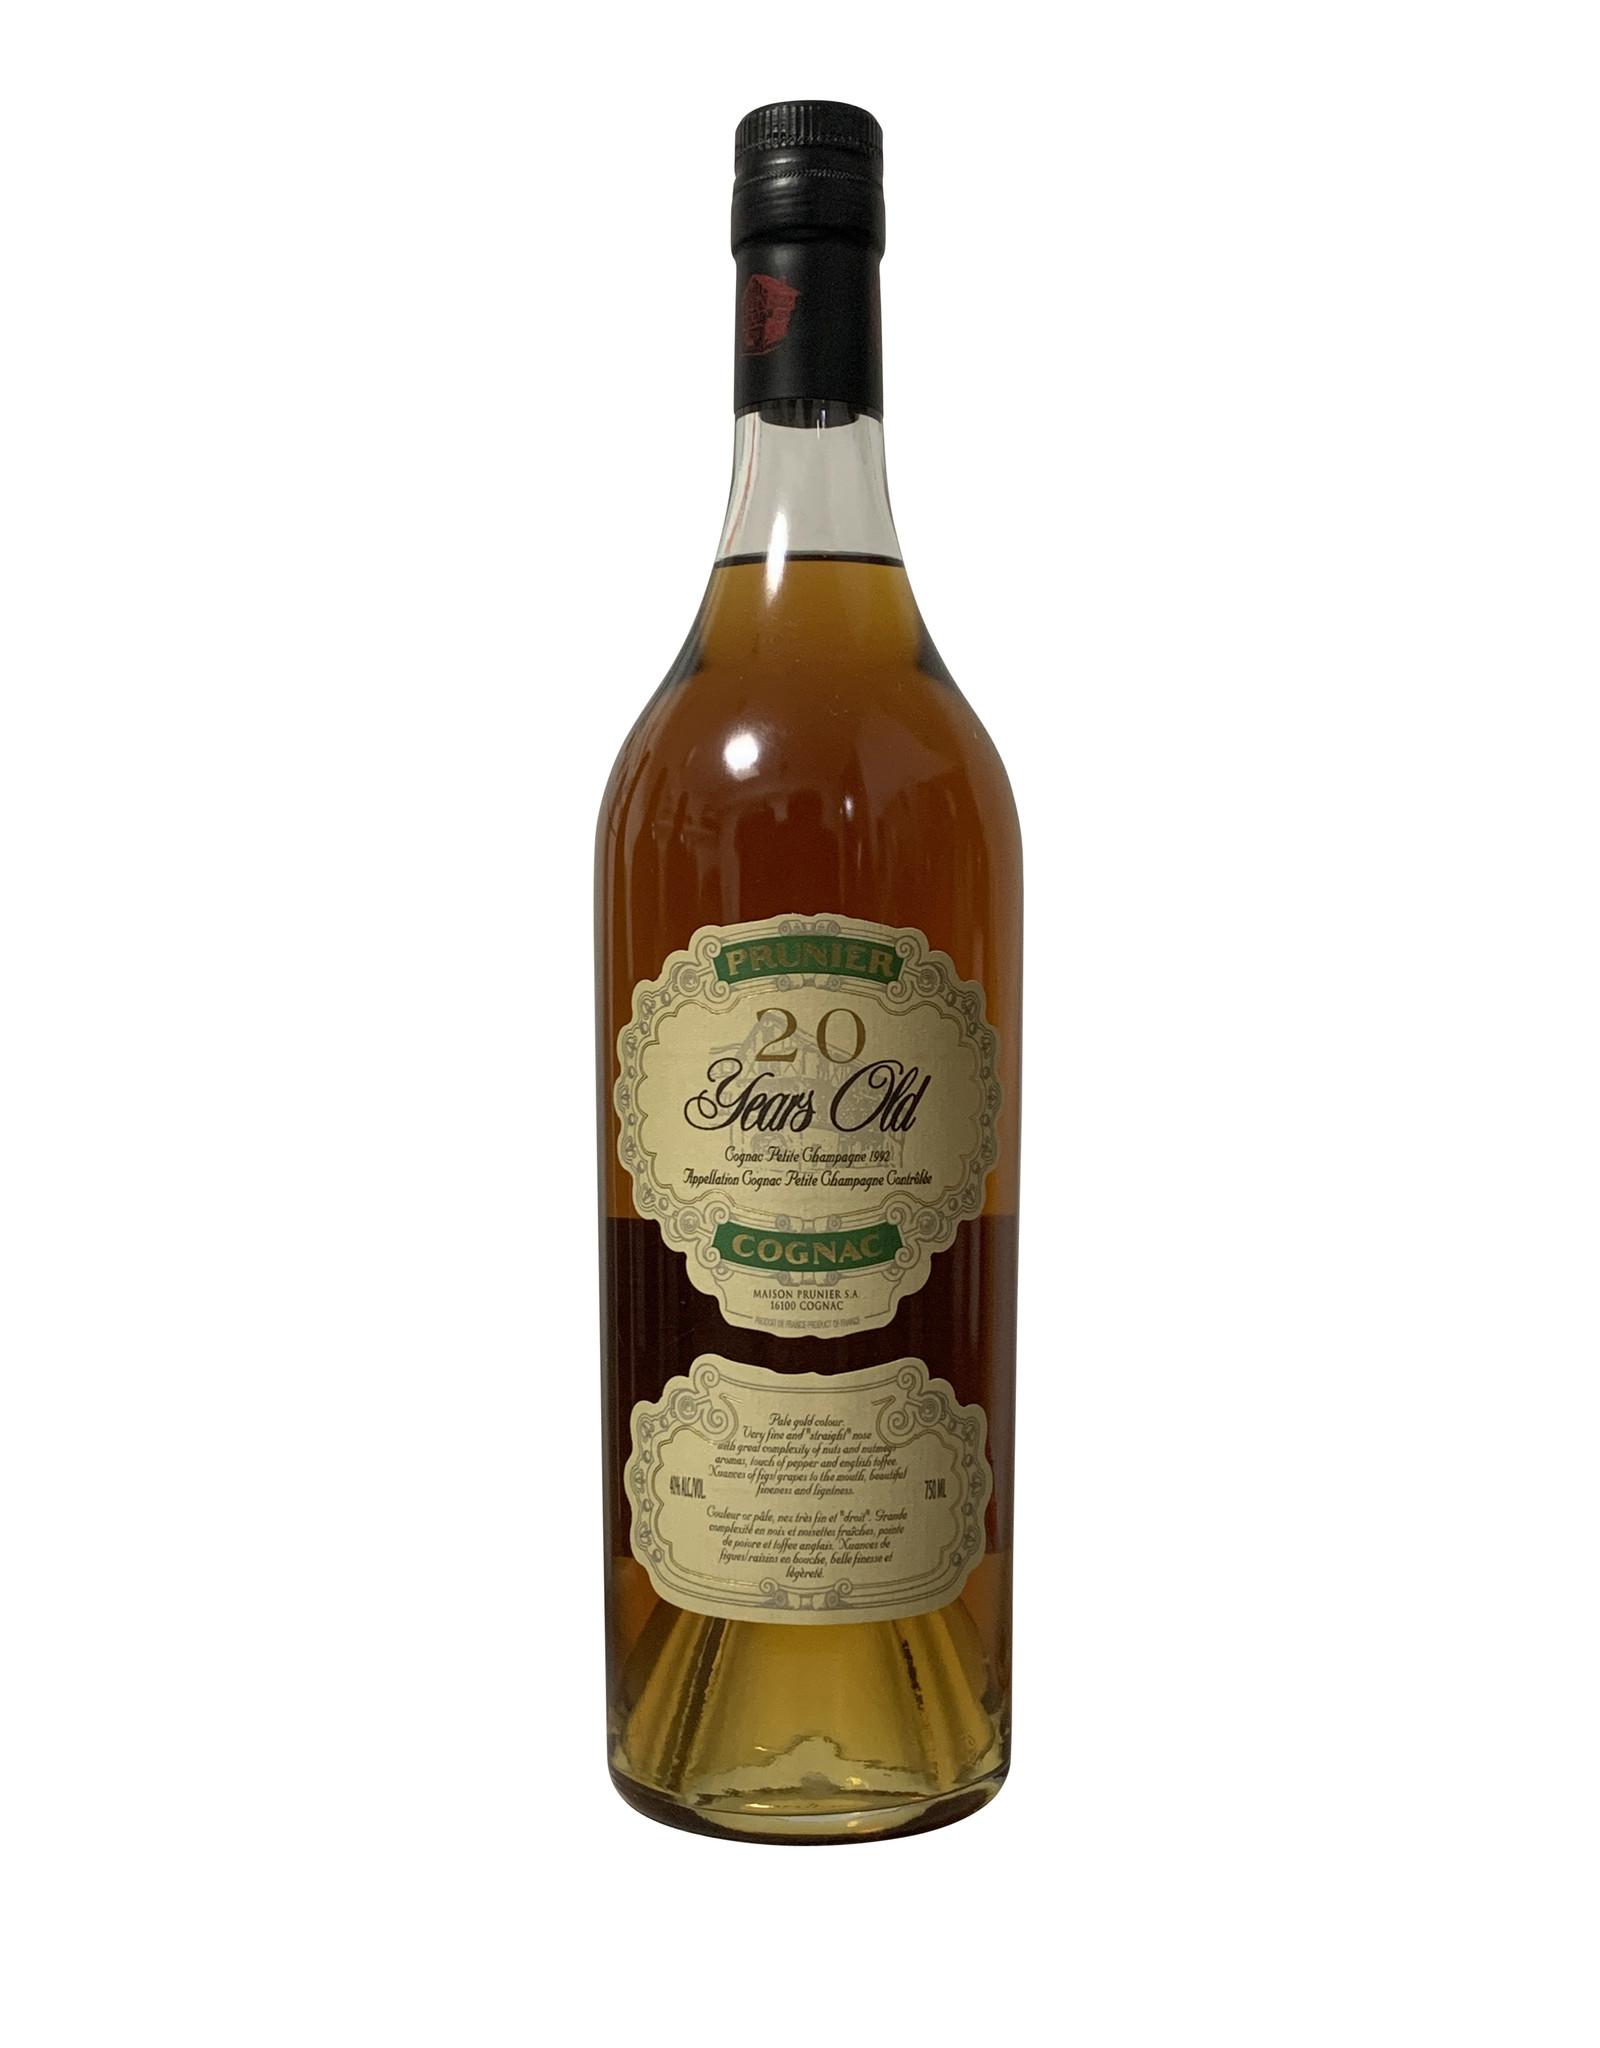 Prunier Prunier Cognac 20 Year-Old NV, Cognac, France (750mL)